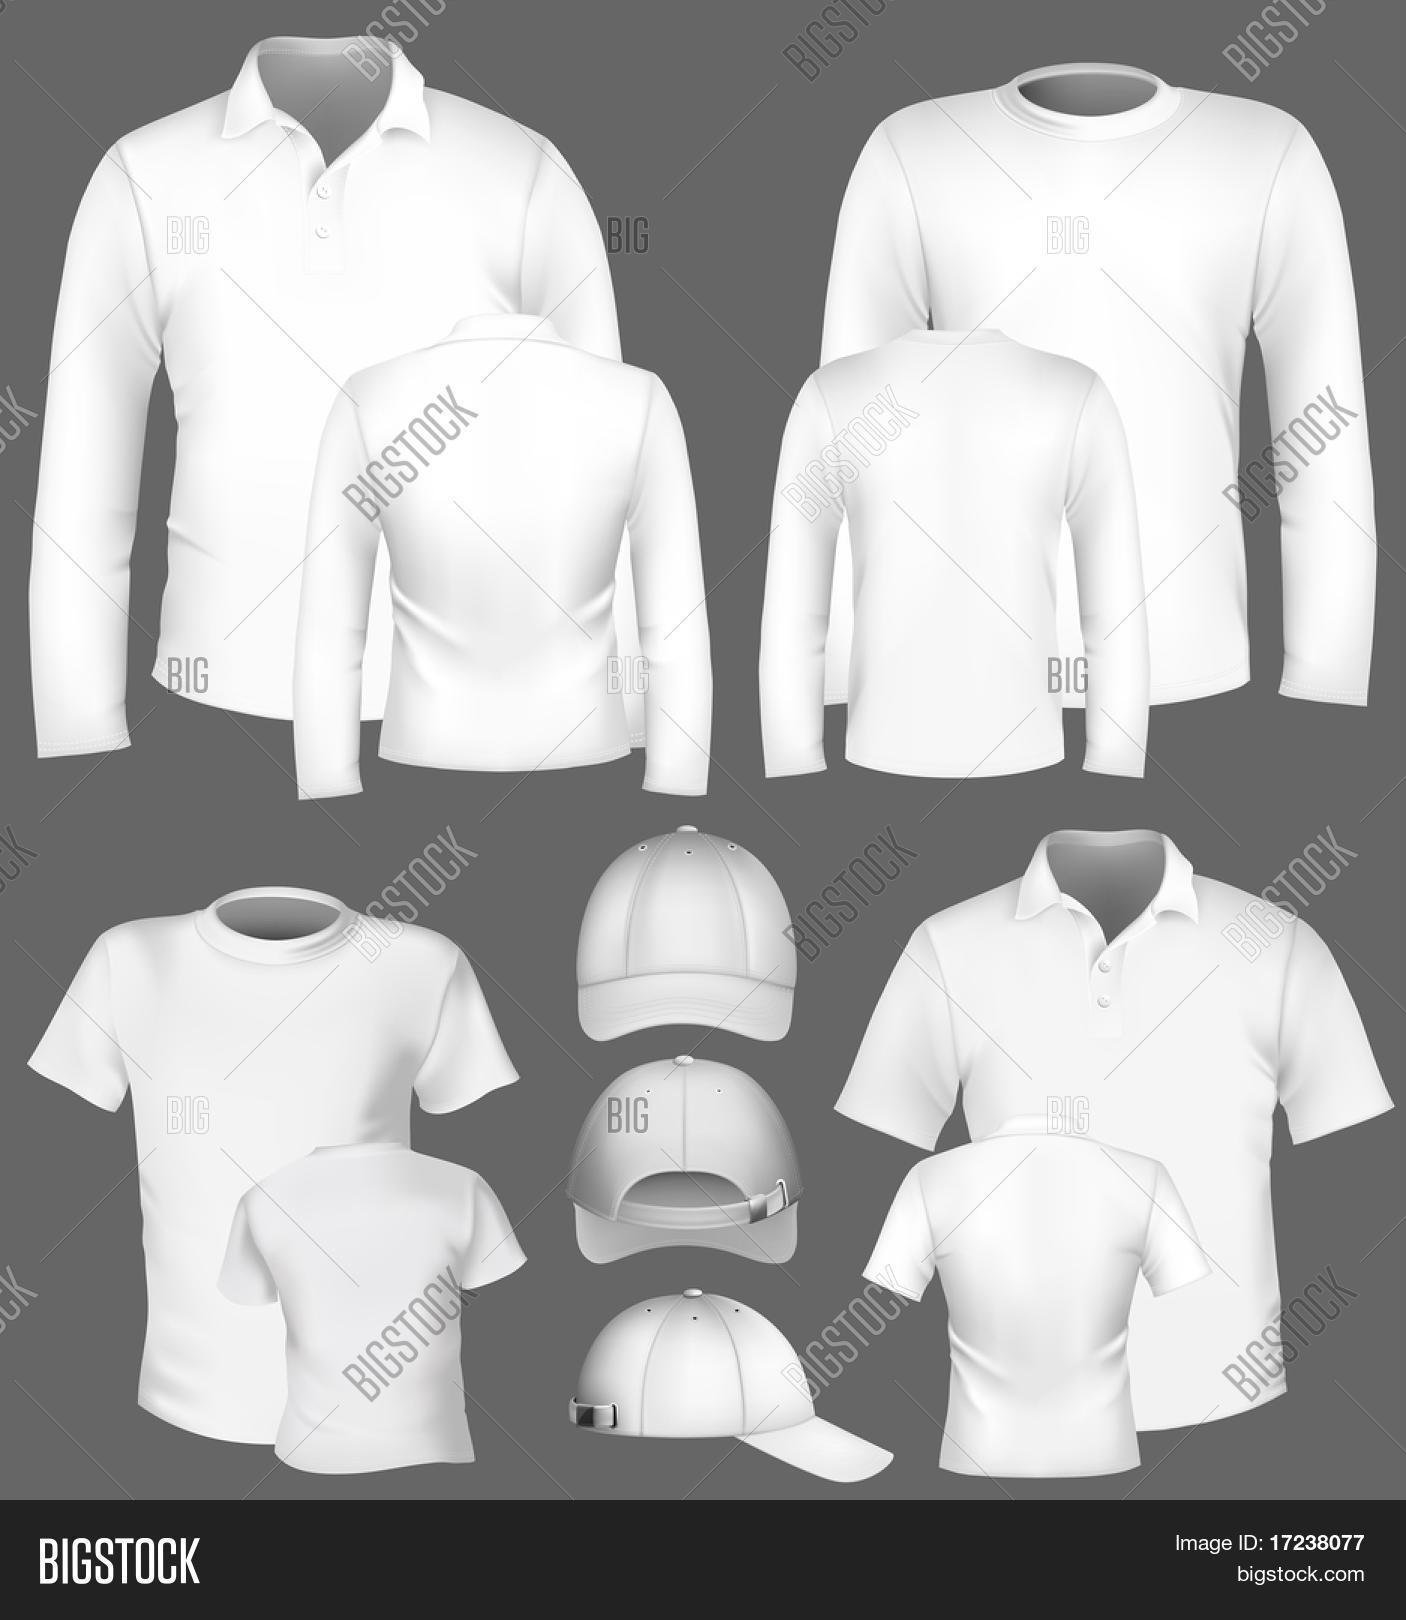 Polo shirt design vector - Polo Shirt Design Vector 64